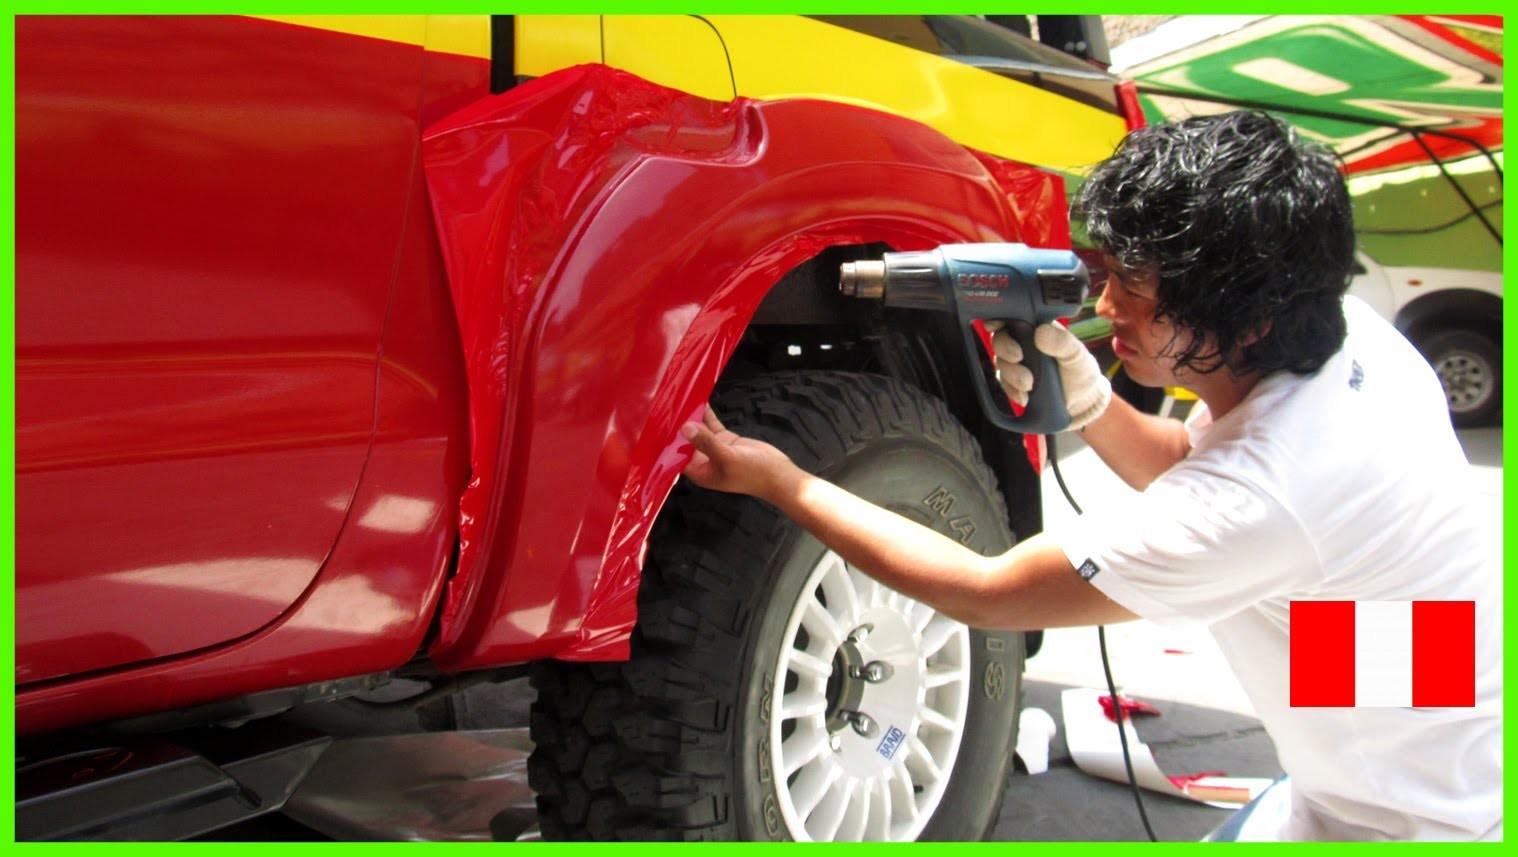 ROTULACION-PLOTEO VEHICULAR-RALLY DAKAR 2013 LIMA PERÚ | Car Wrap - applying vinyl vehicle